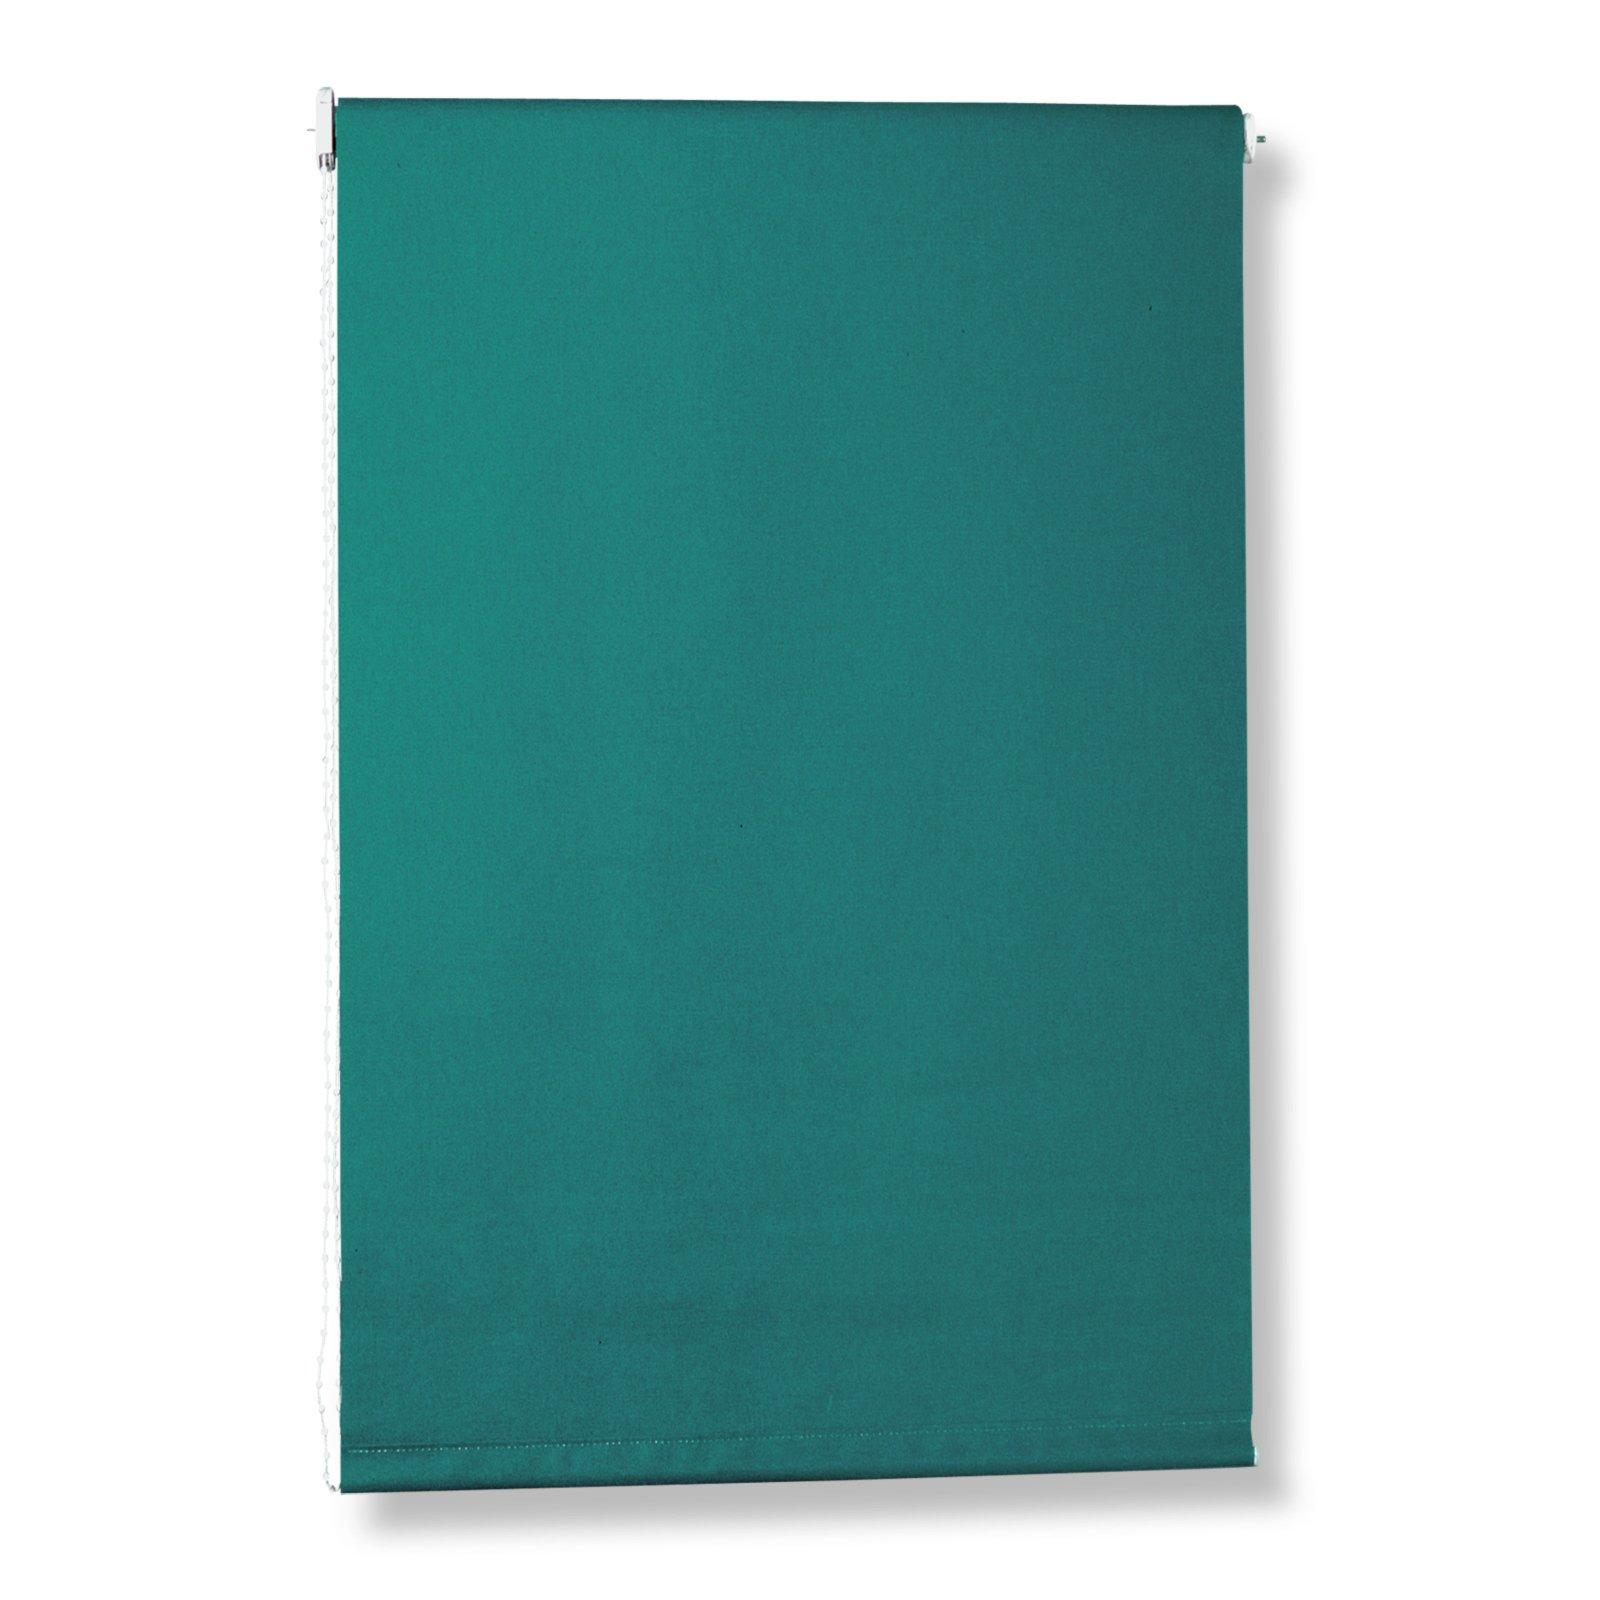 Rollo - mint - 100x180 cm